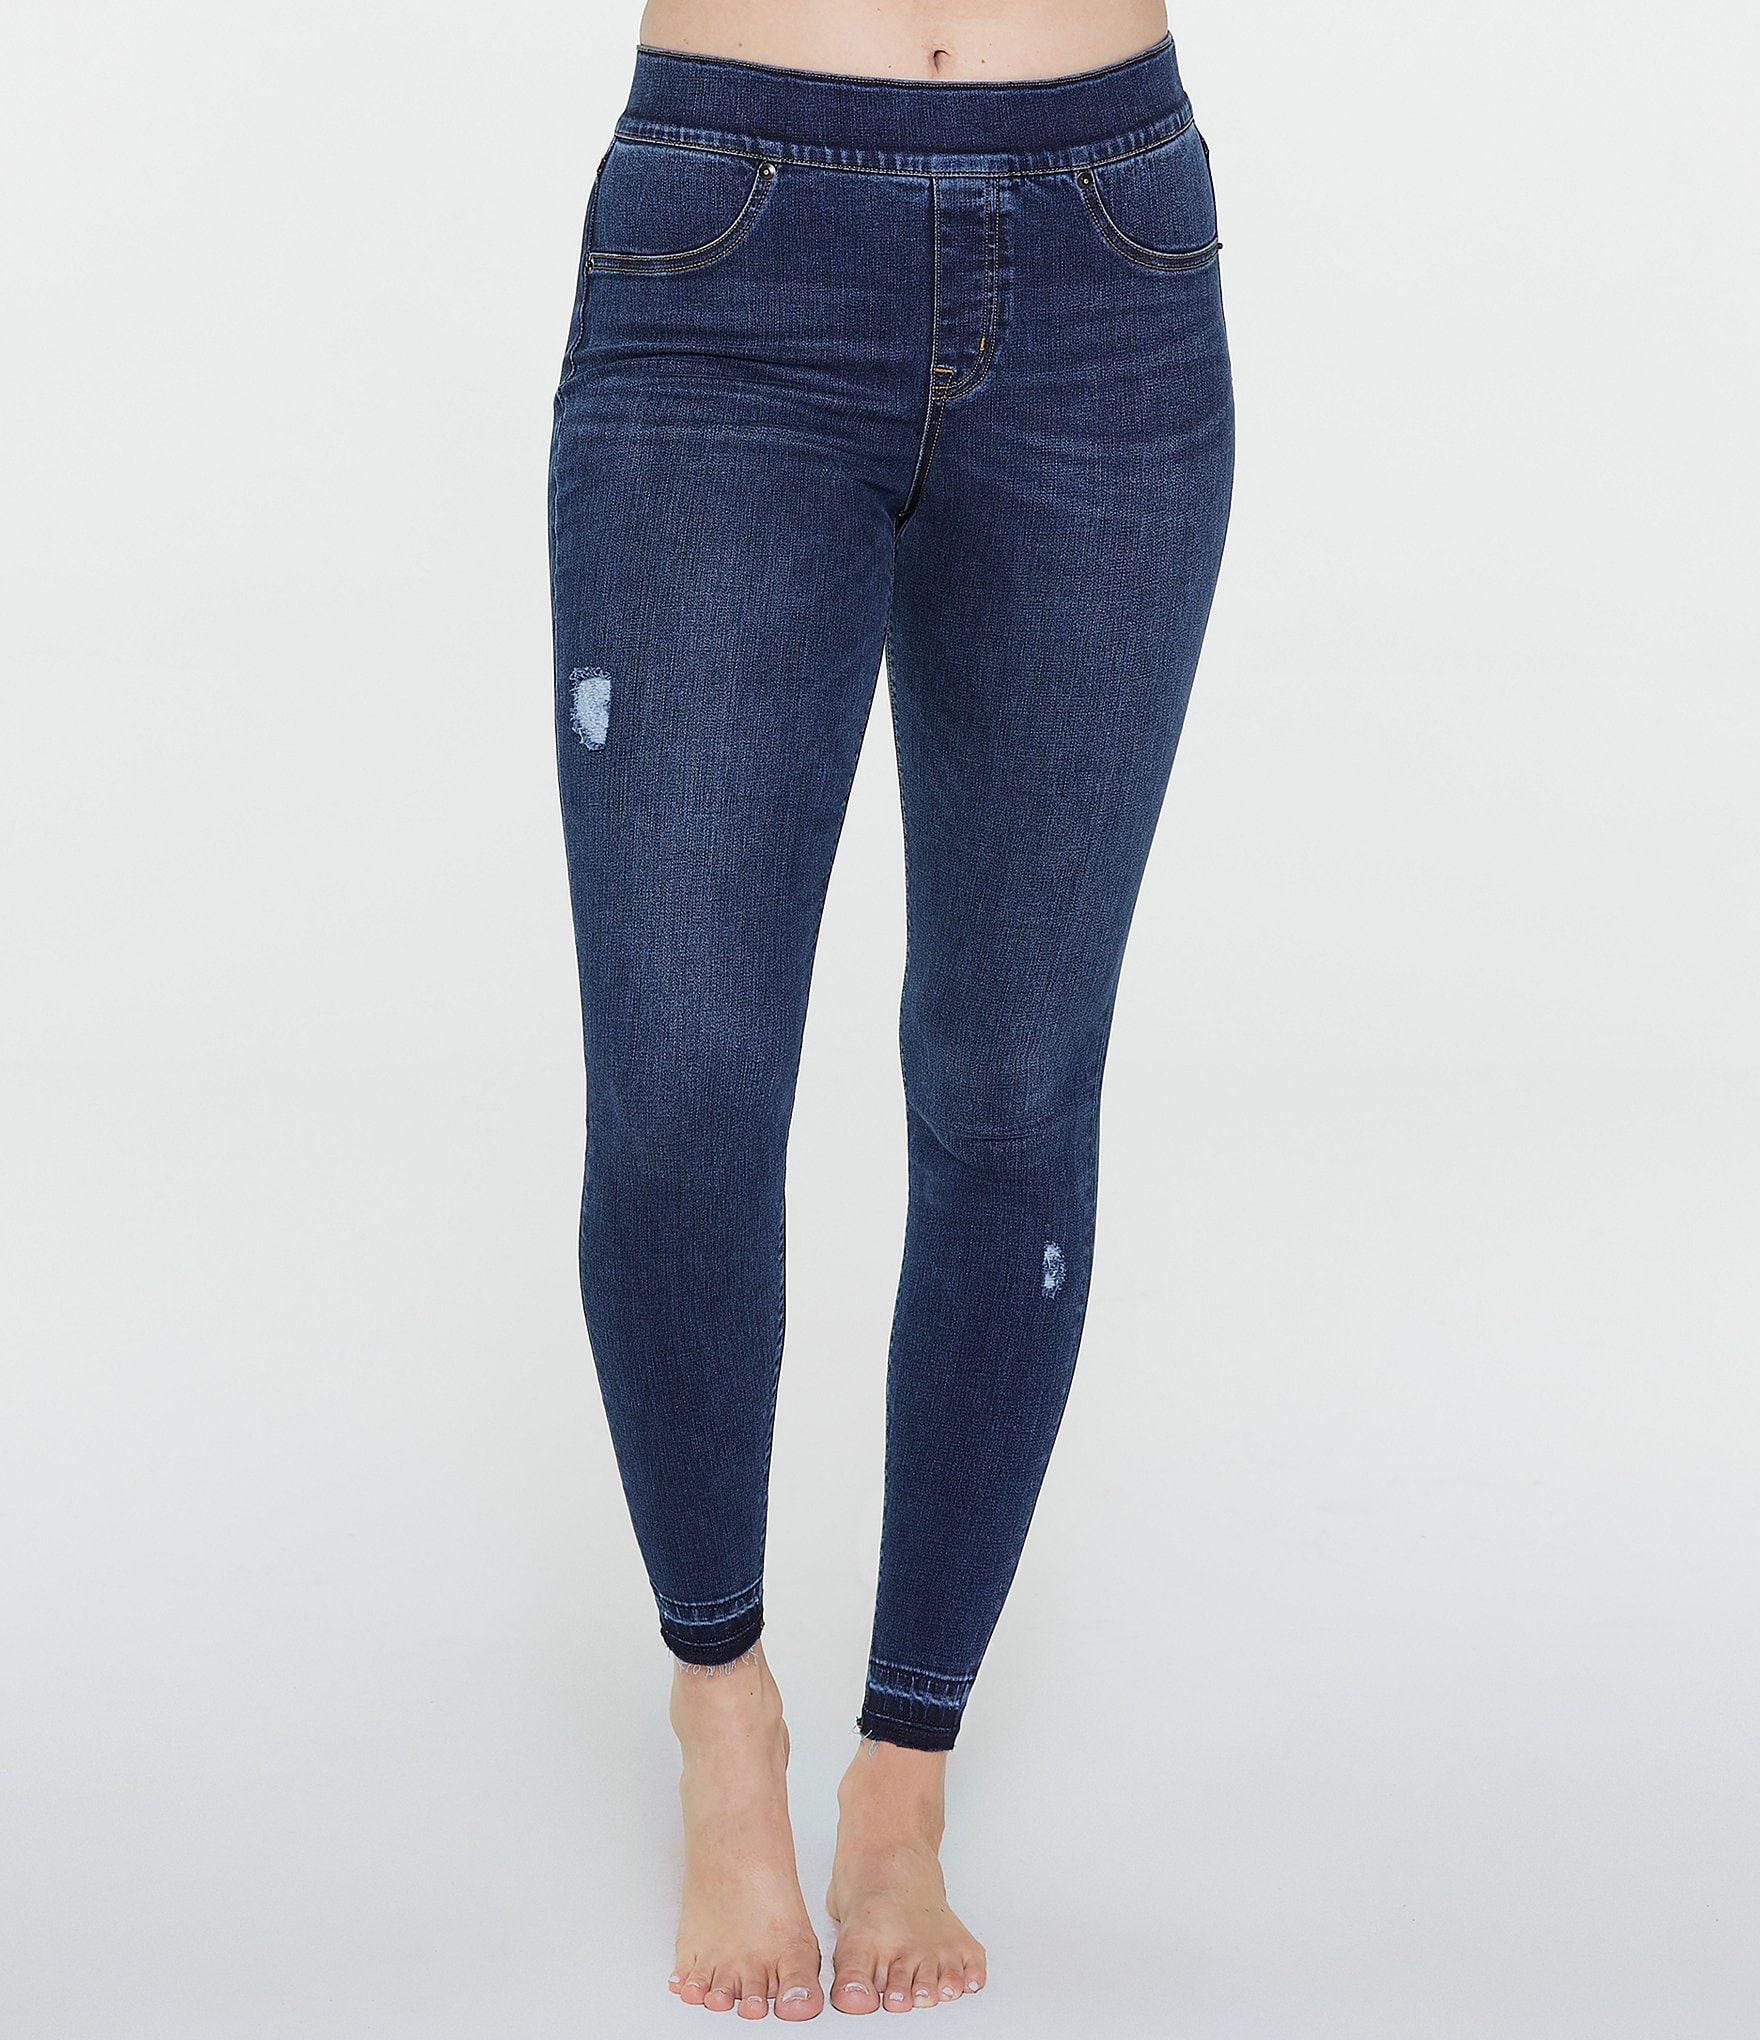 1c9ee09c57 Spanx Distressed Denim Leggings | Dillard's